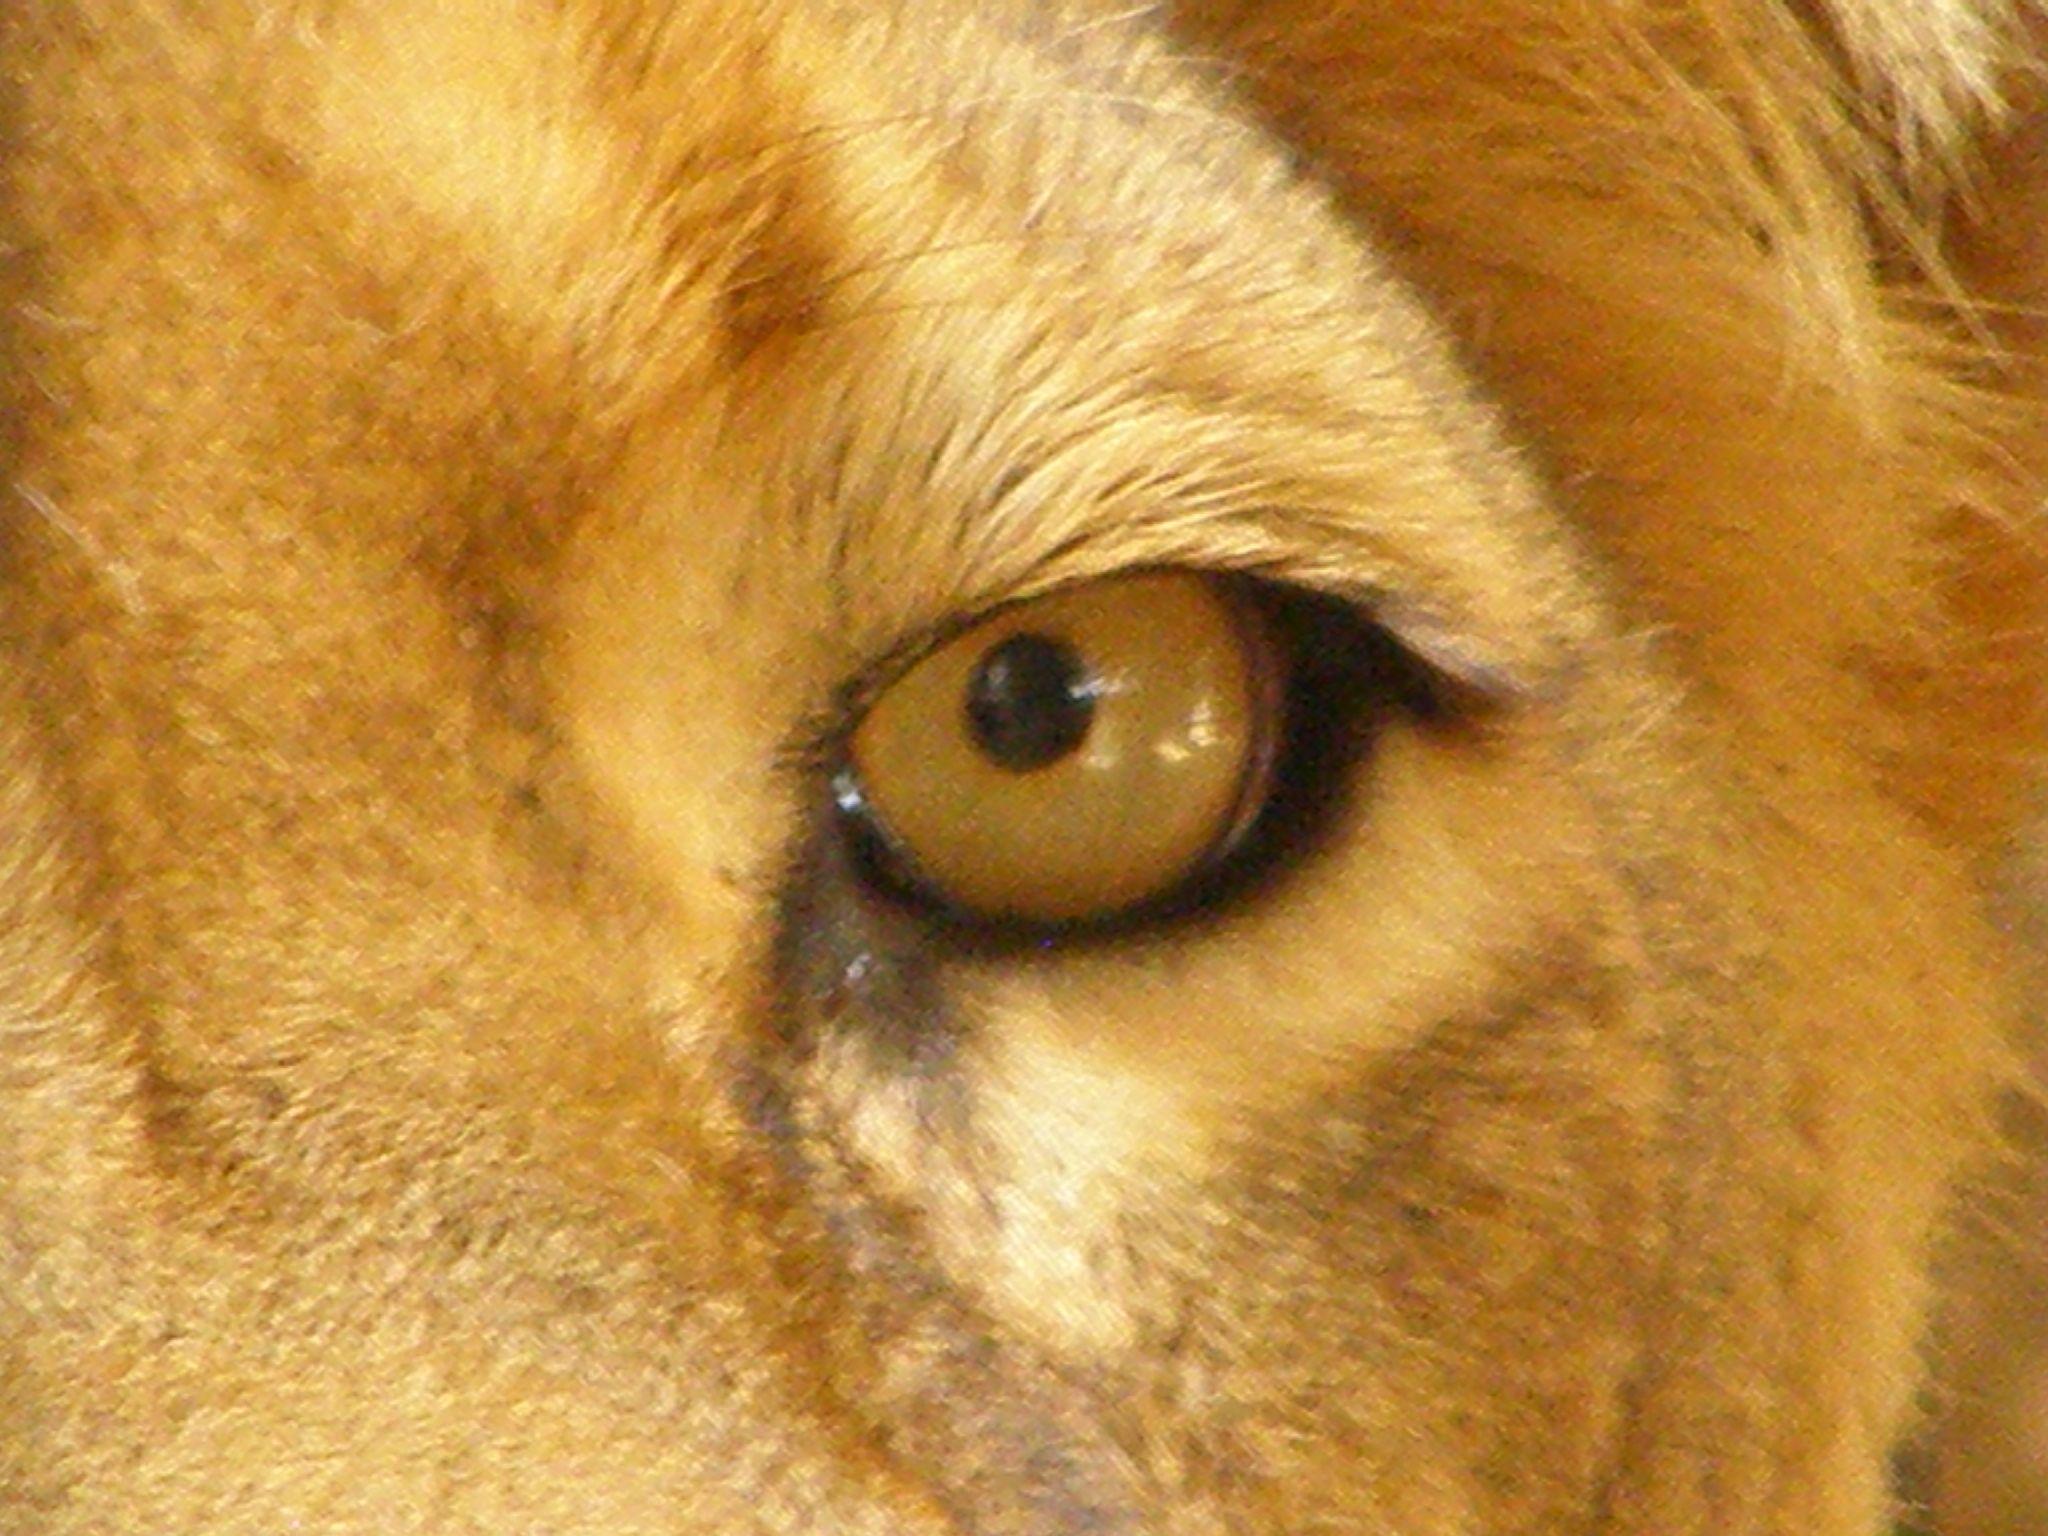 file lion panthera leo eye close wikimedia commons. Black Bedroom Furniture Sets. Home Design Ideas